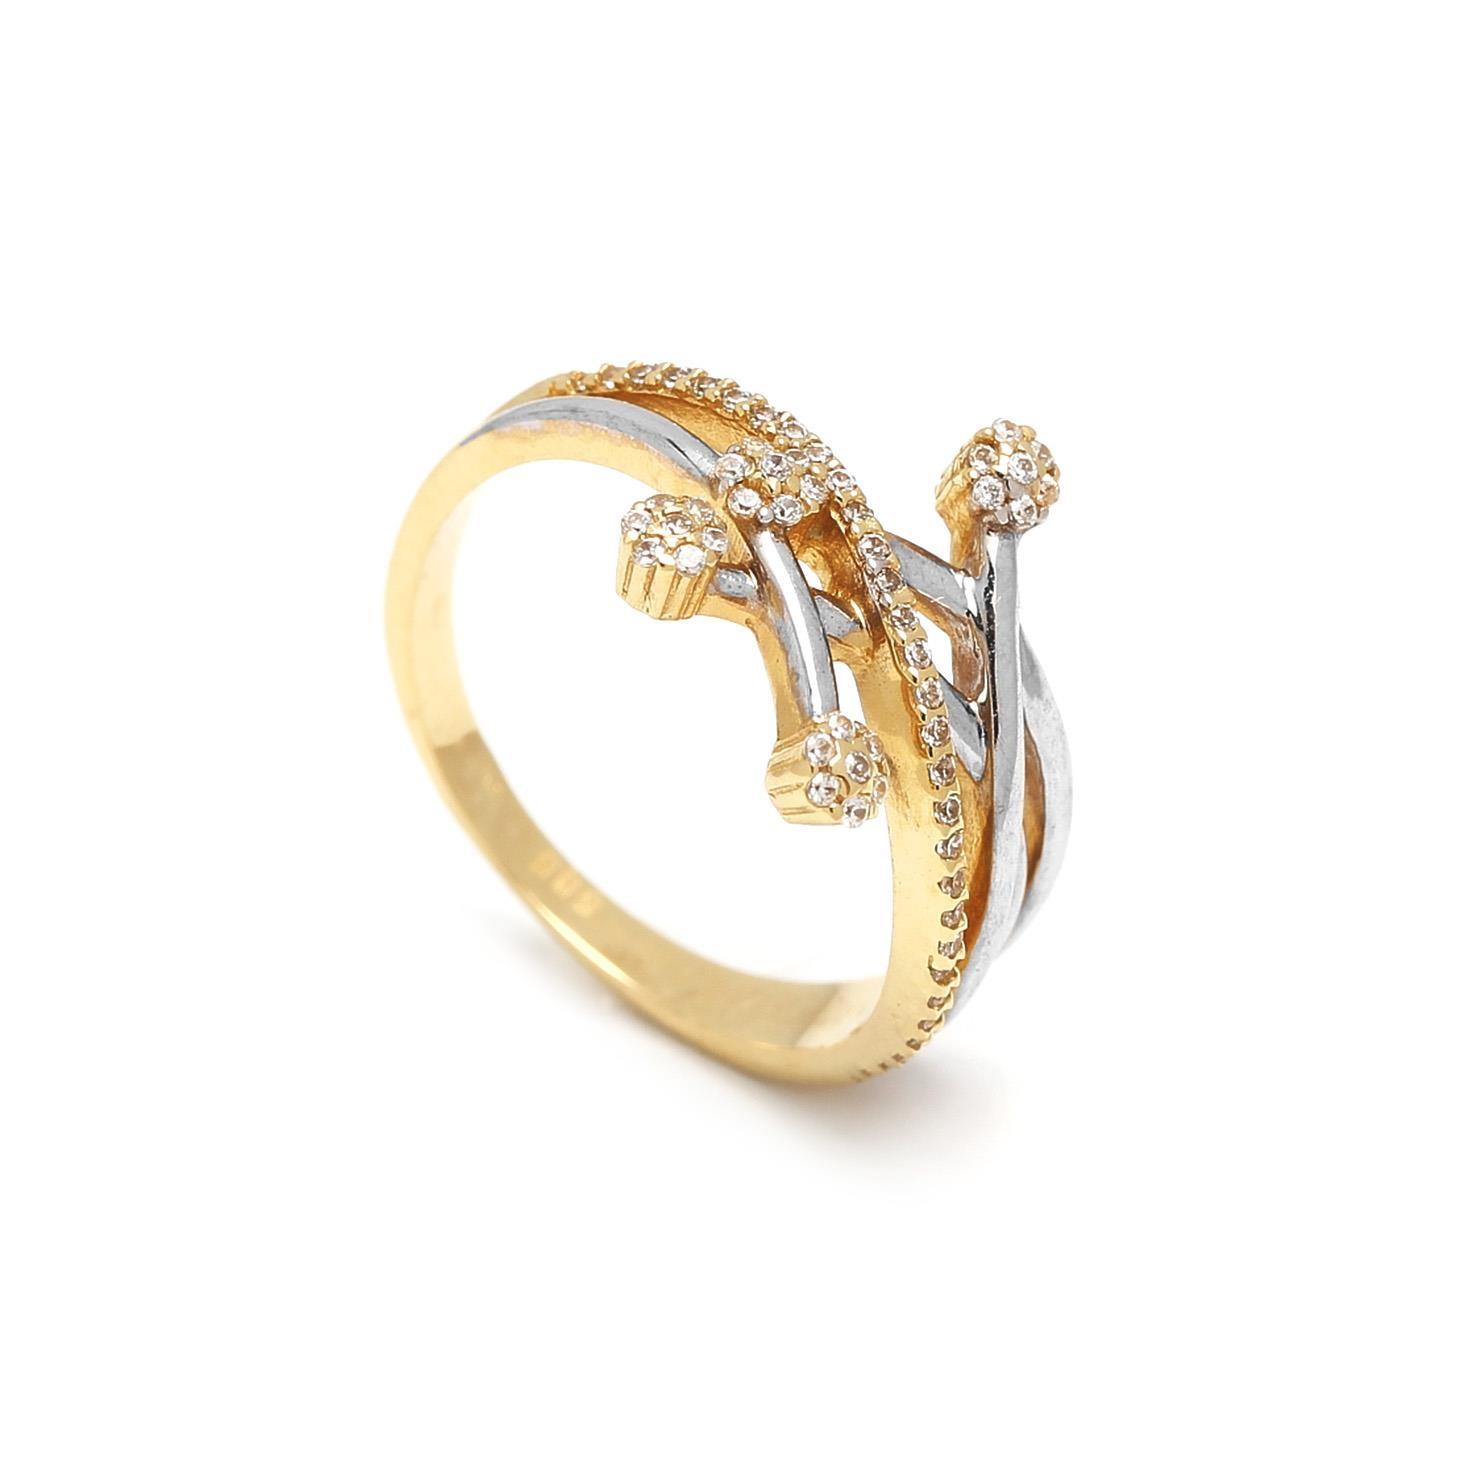 Zlatý dámsky prsteň DEBORA 1PK00005